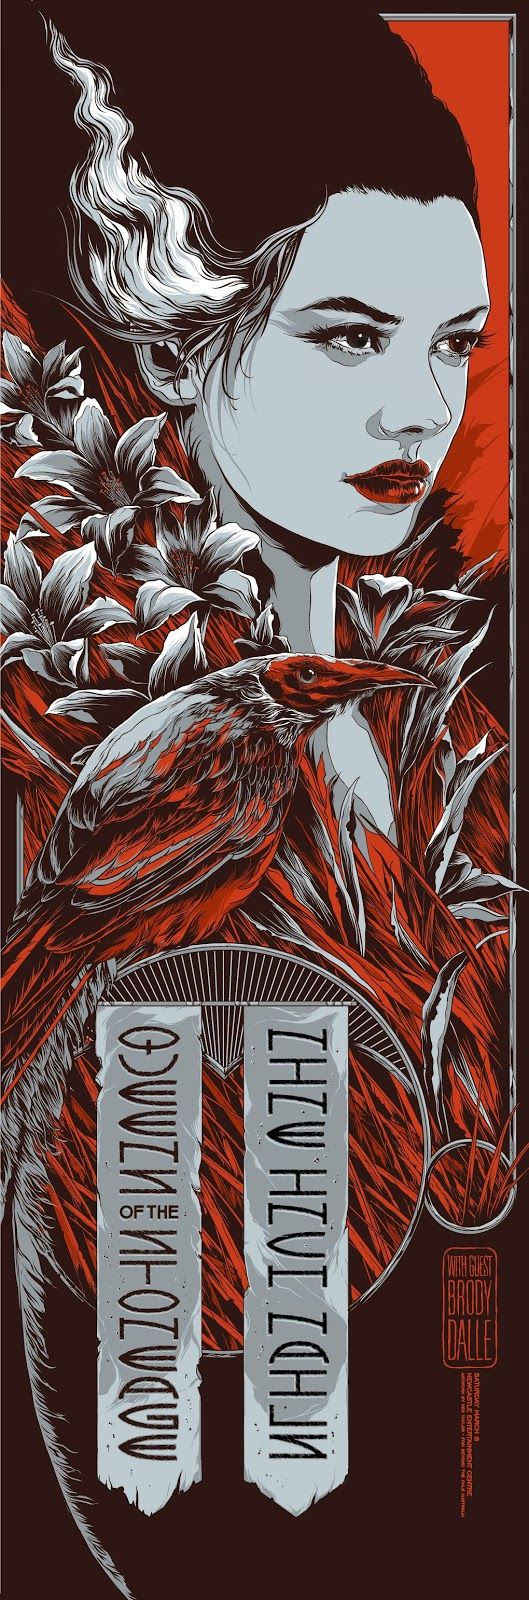 pinterest.com/fra411 #illustration - Ken-Taylor-Nine-Inch-Nails-Queens-of-the-Stone-Age-Sydney-Poster